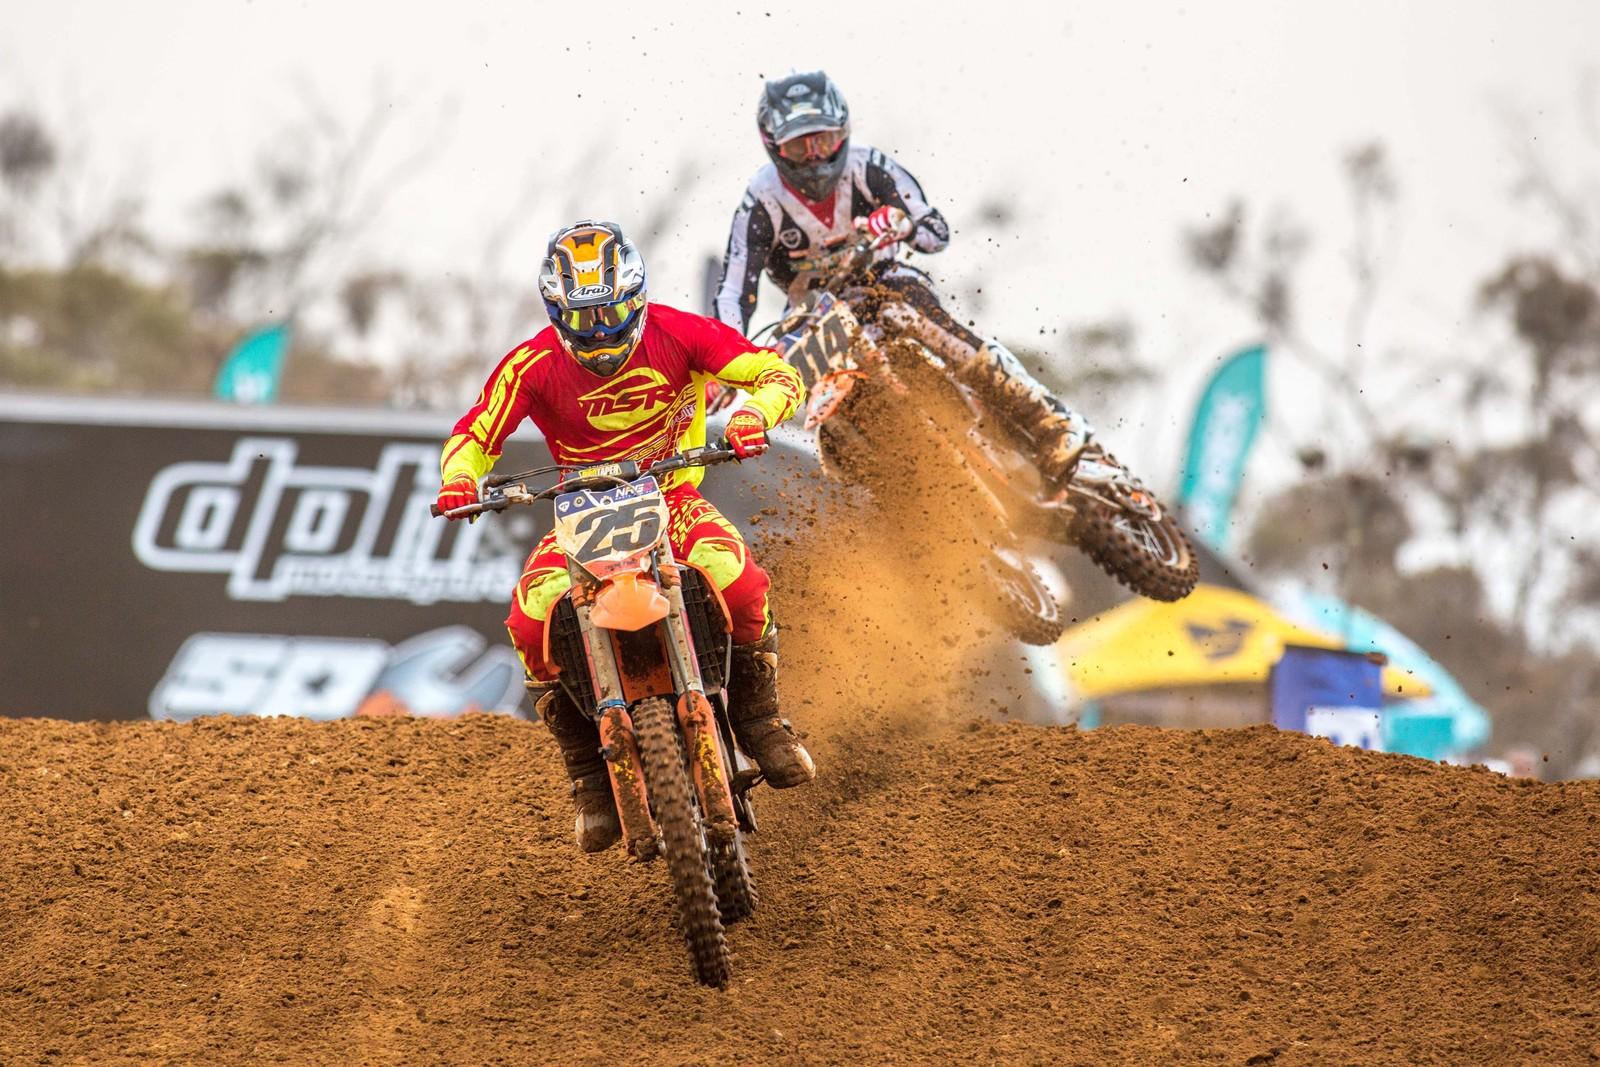 Jamie Law - Australian Motul Mx Championships: Round 4, Murray Bridge - Motocross Pictures - Vital MX